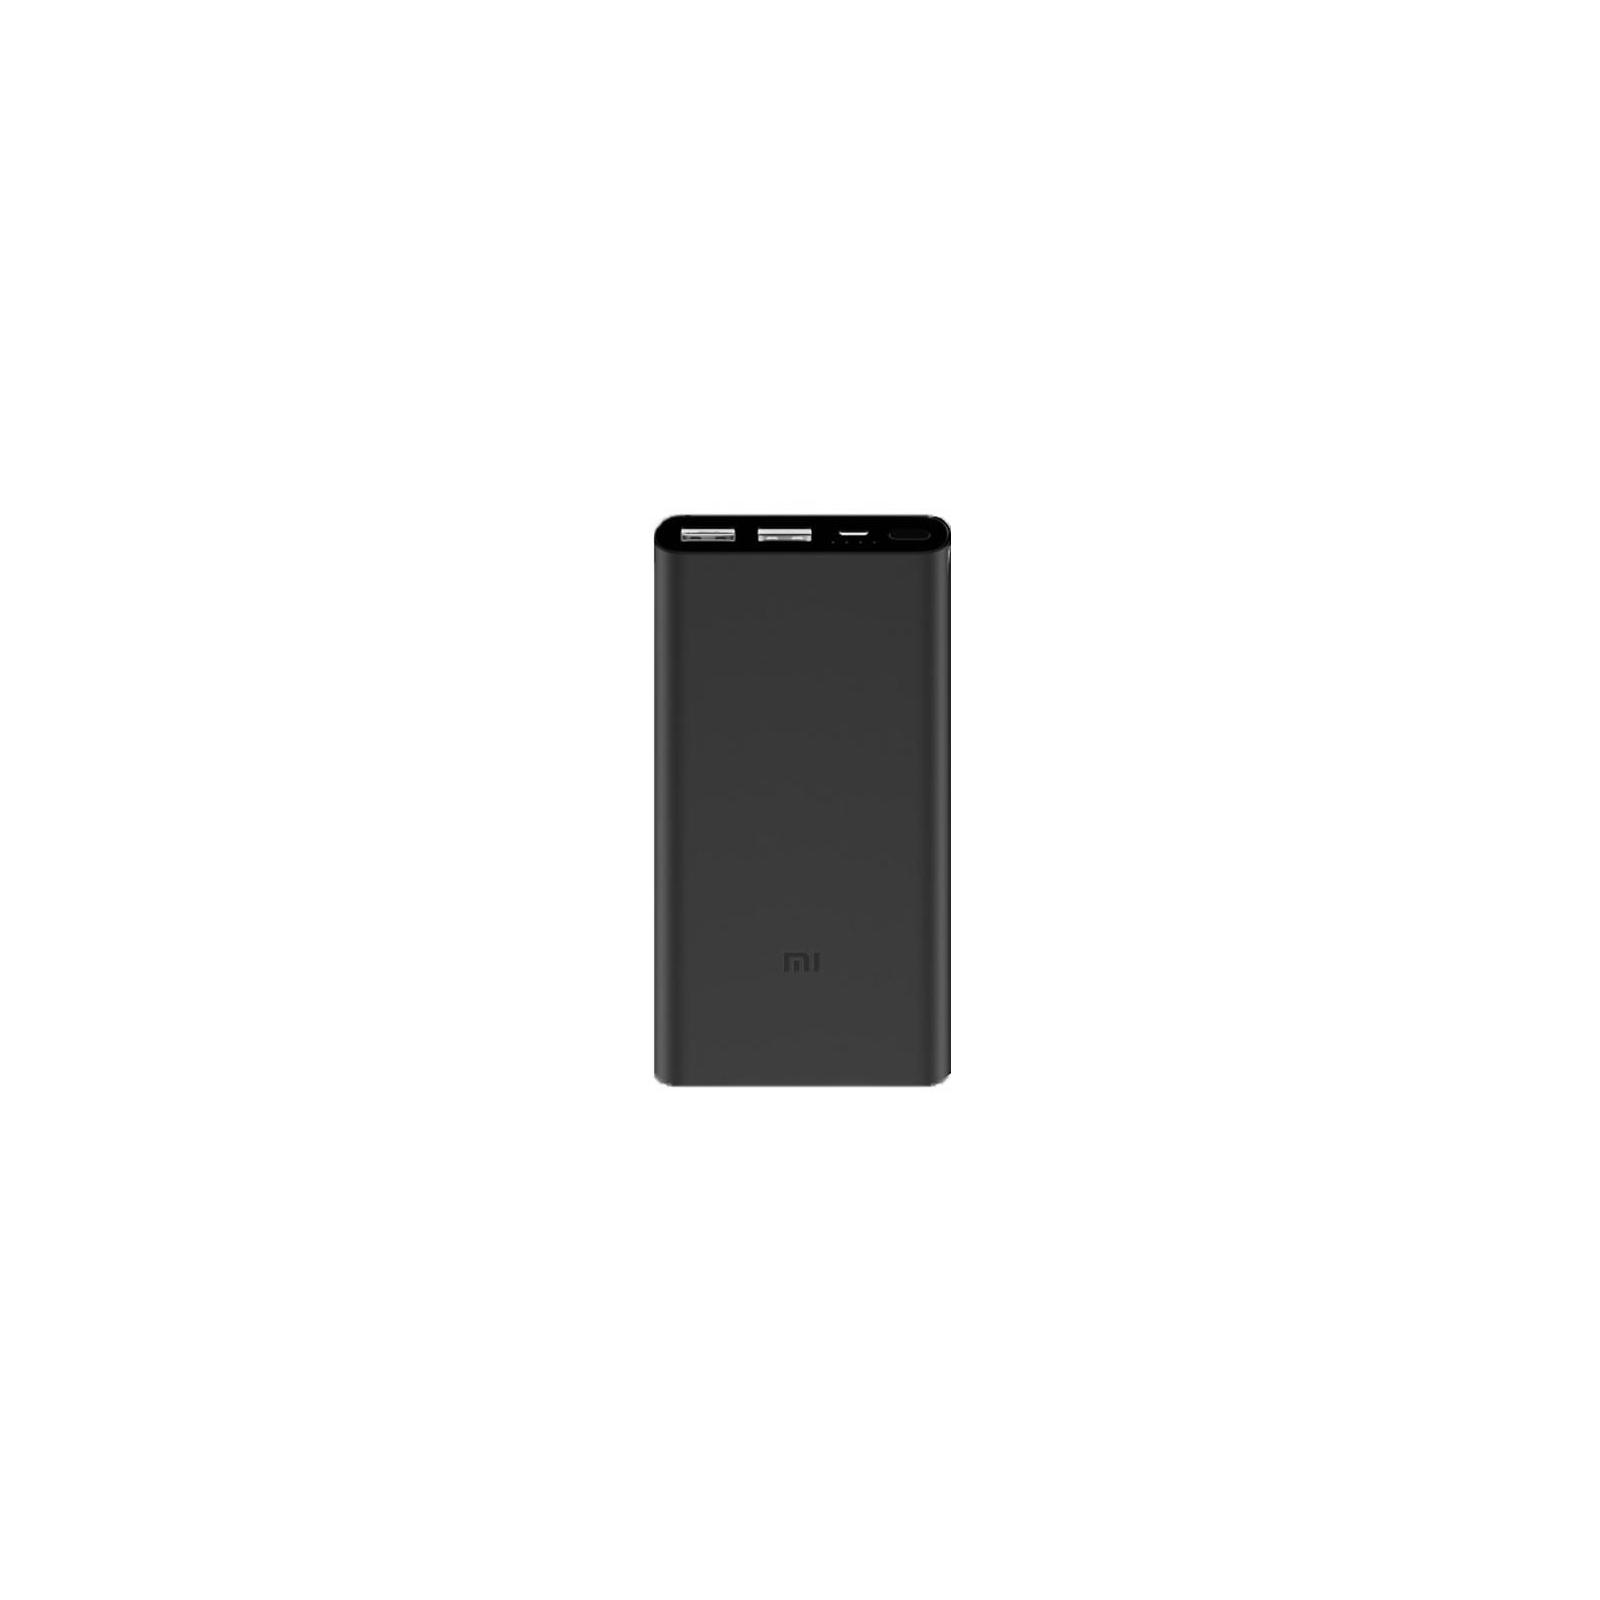 Батарея универсальная Xiaomi Mi Power Bank 2S 10000 mAh QC2.0(2.4A,2USB) (PLM09ZM) Black (VXN4229CN / VXN4230GL)